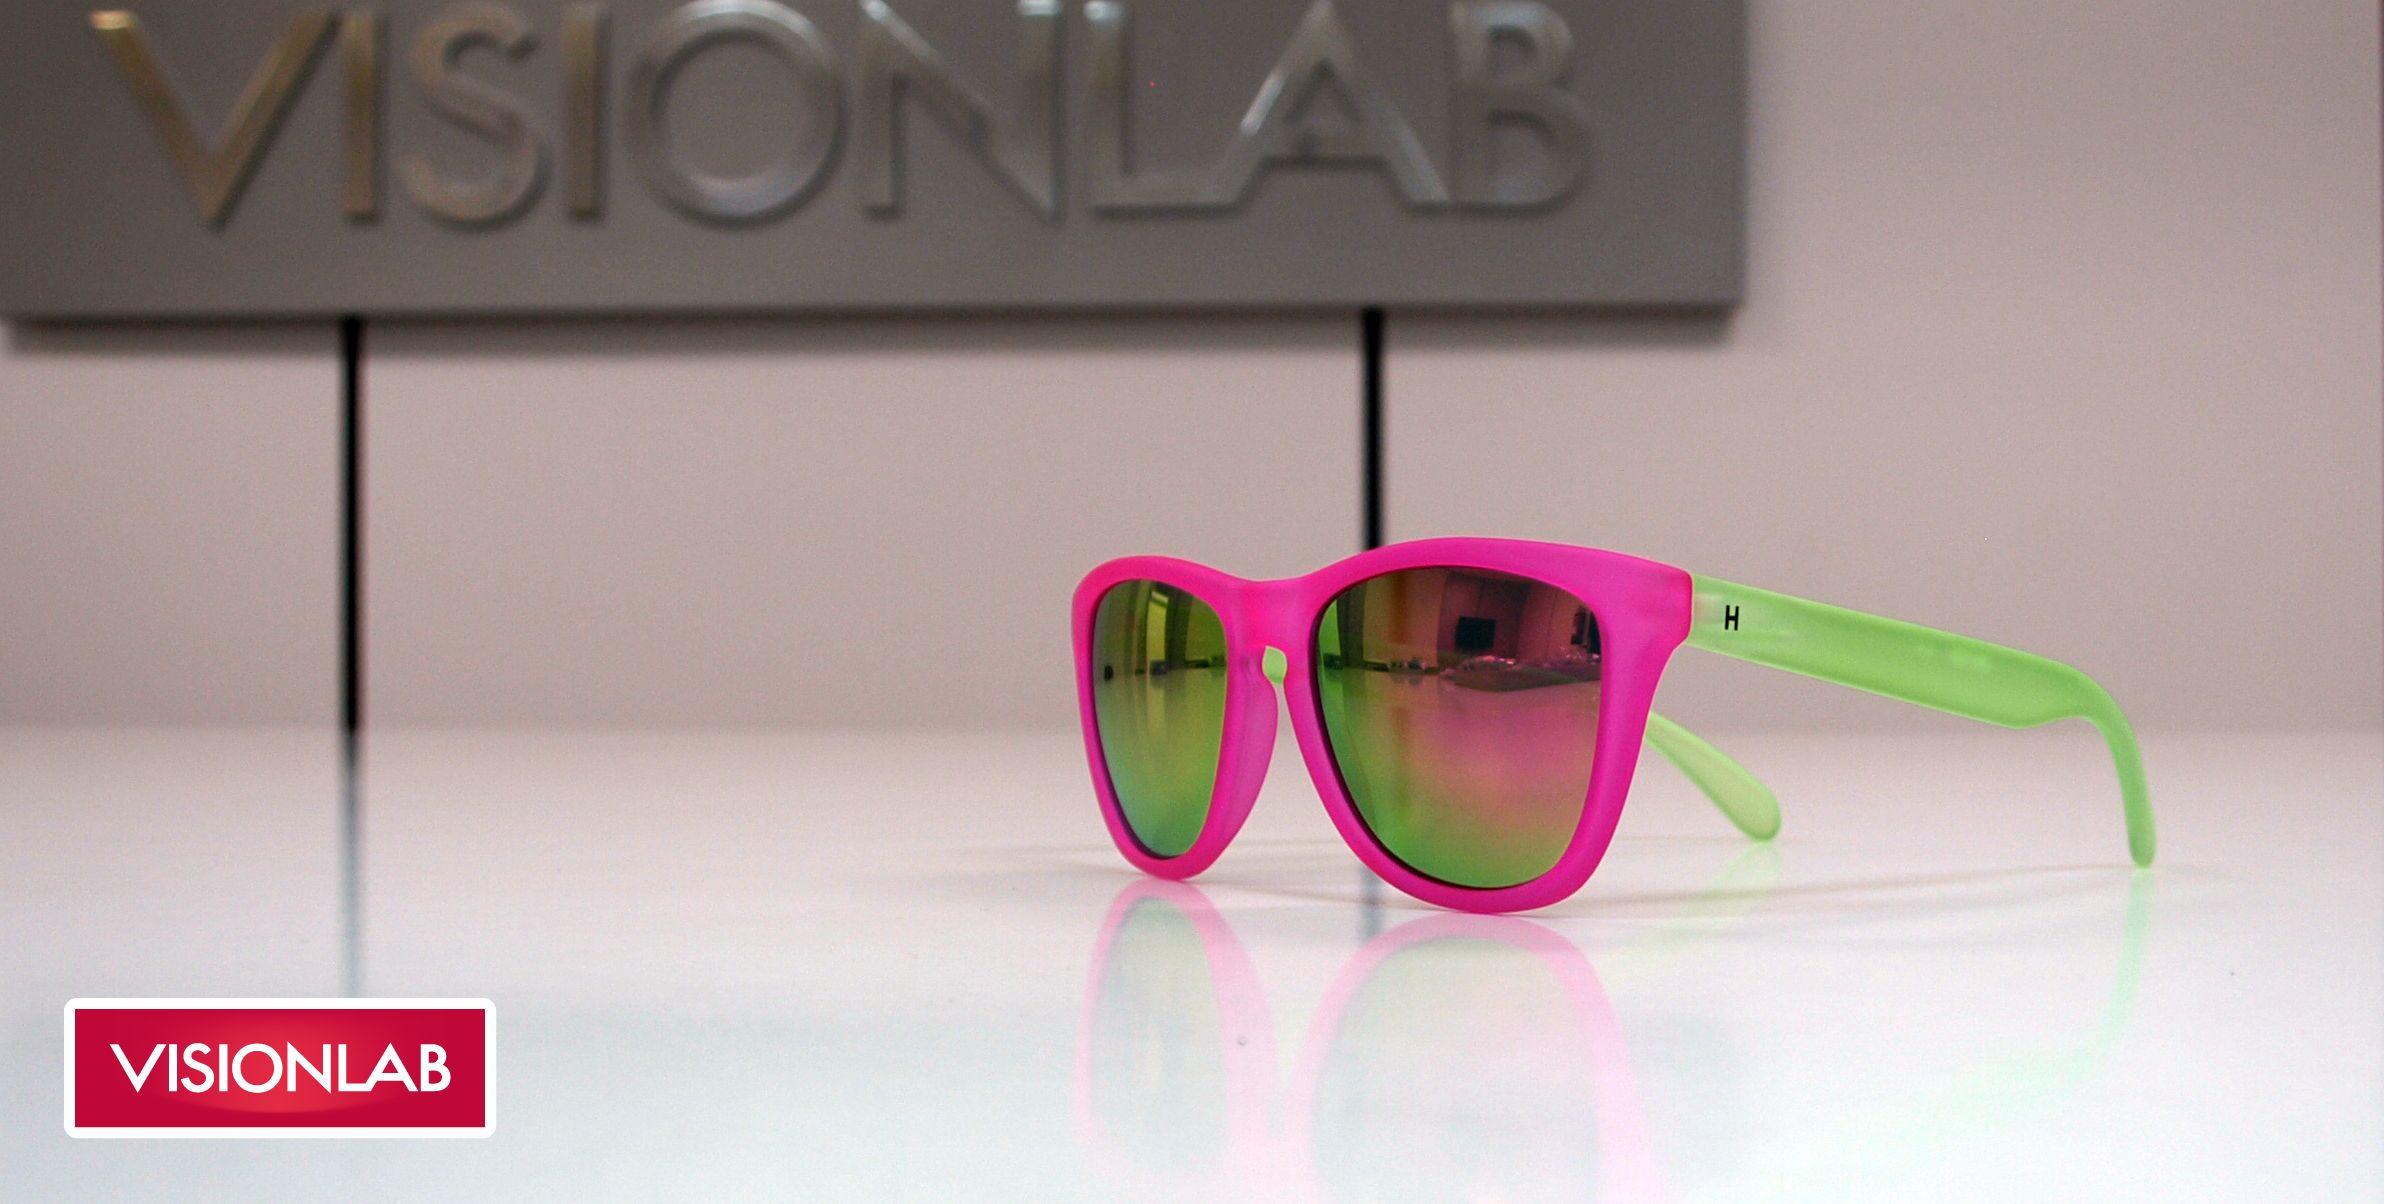 520ca4256e Gafas de sol espejadas rosas y verdes Hevian http://www.visionlab.